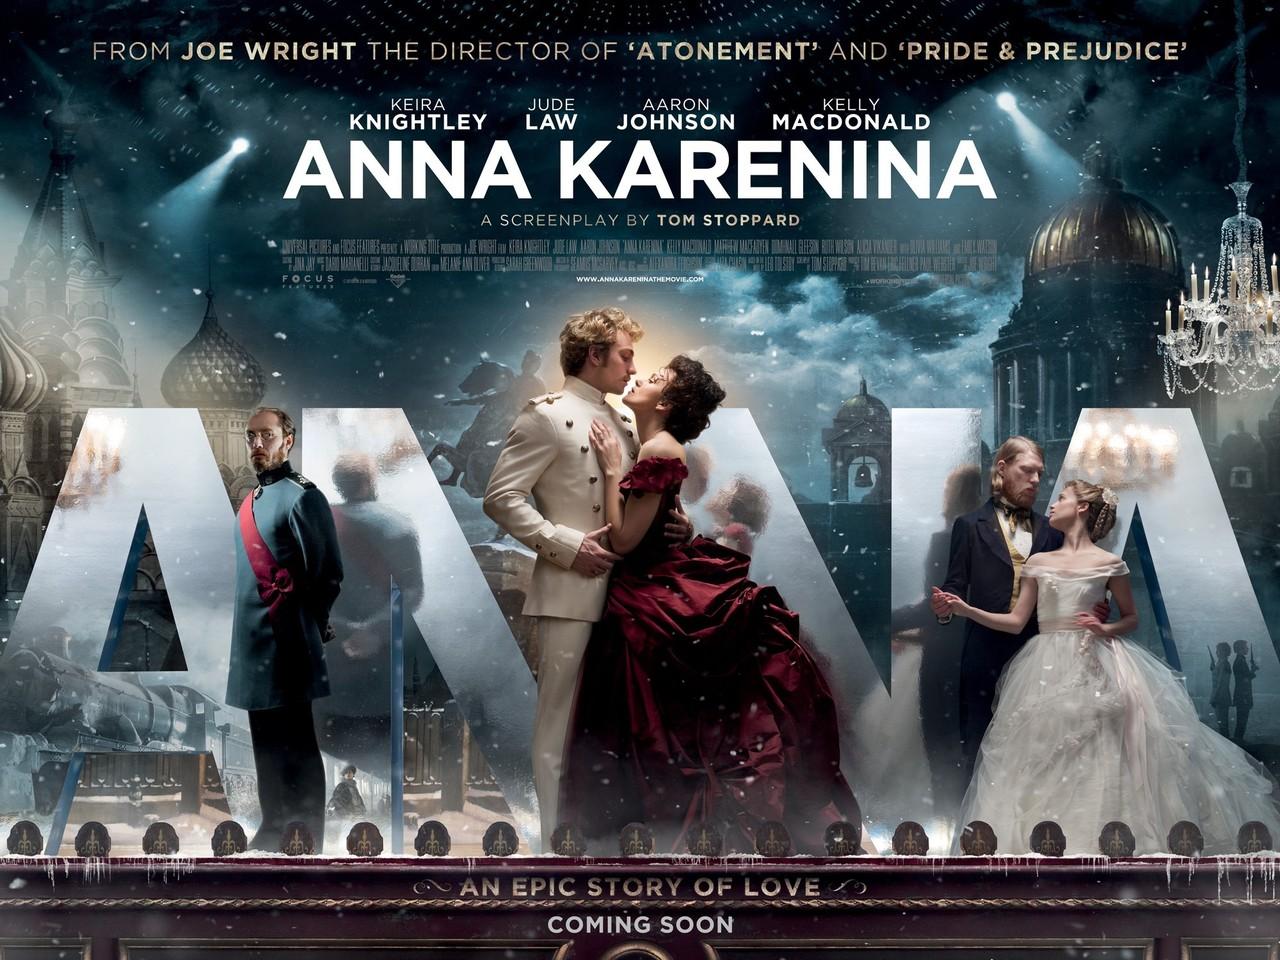 anna-karenina-2012-anna-karenina-by-joe-wright-31213779-1280-960.jpg